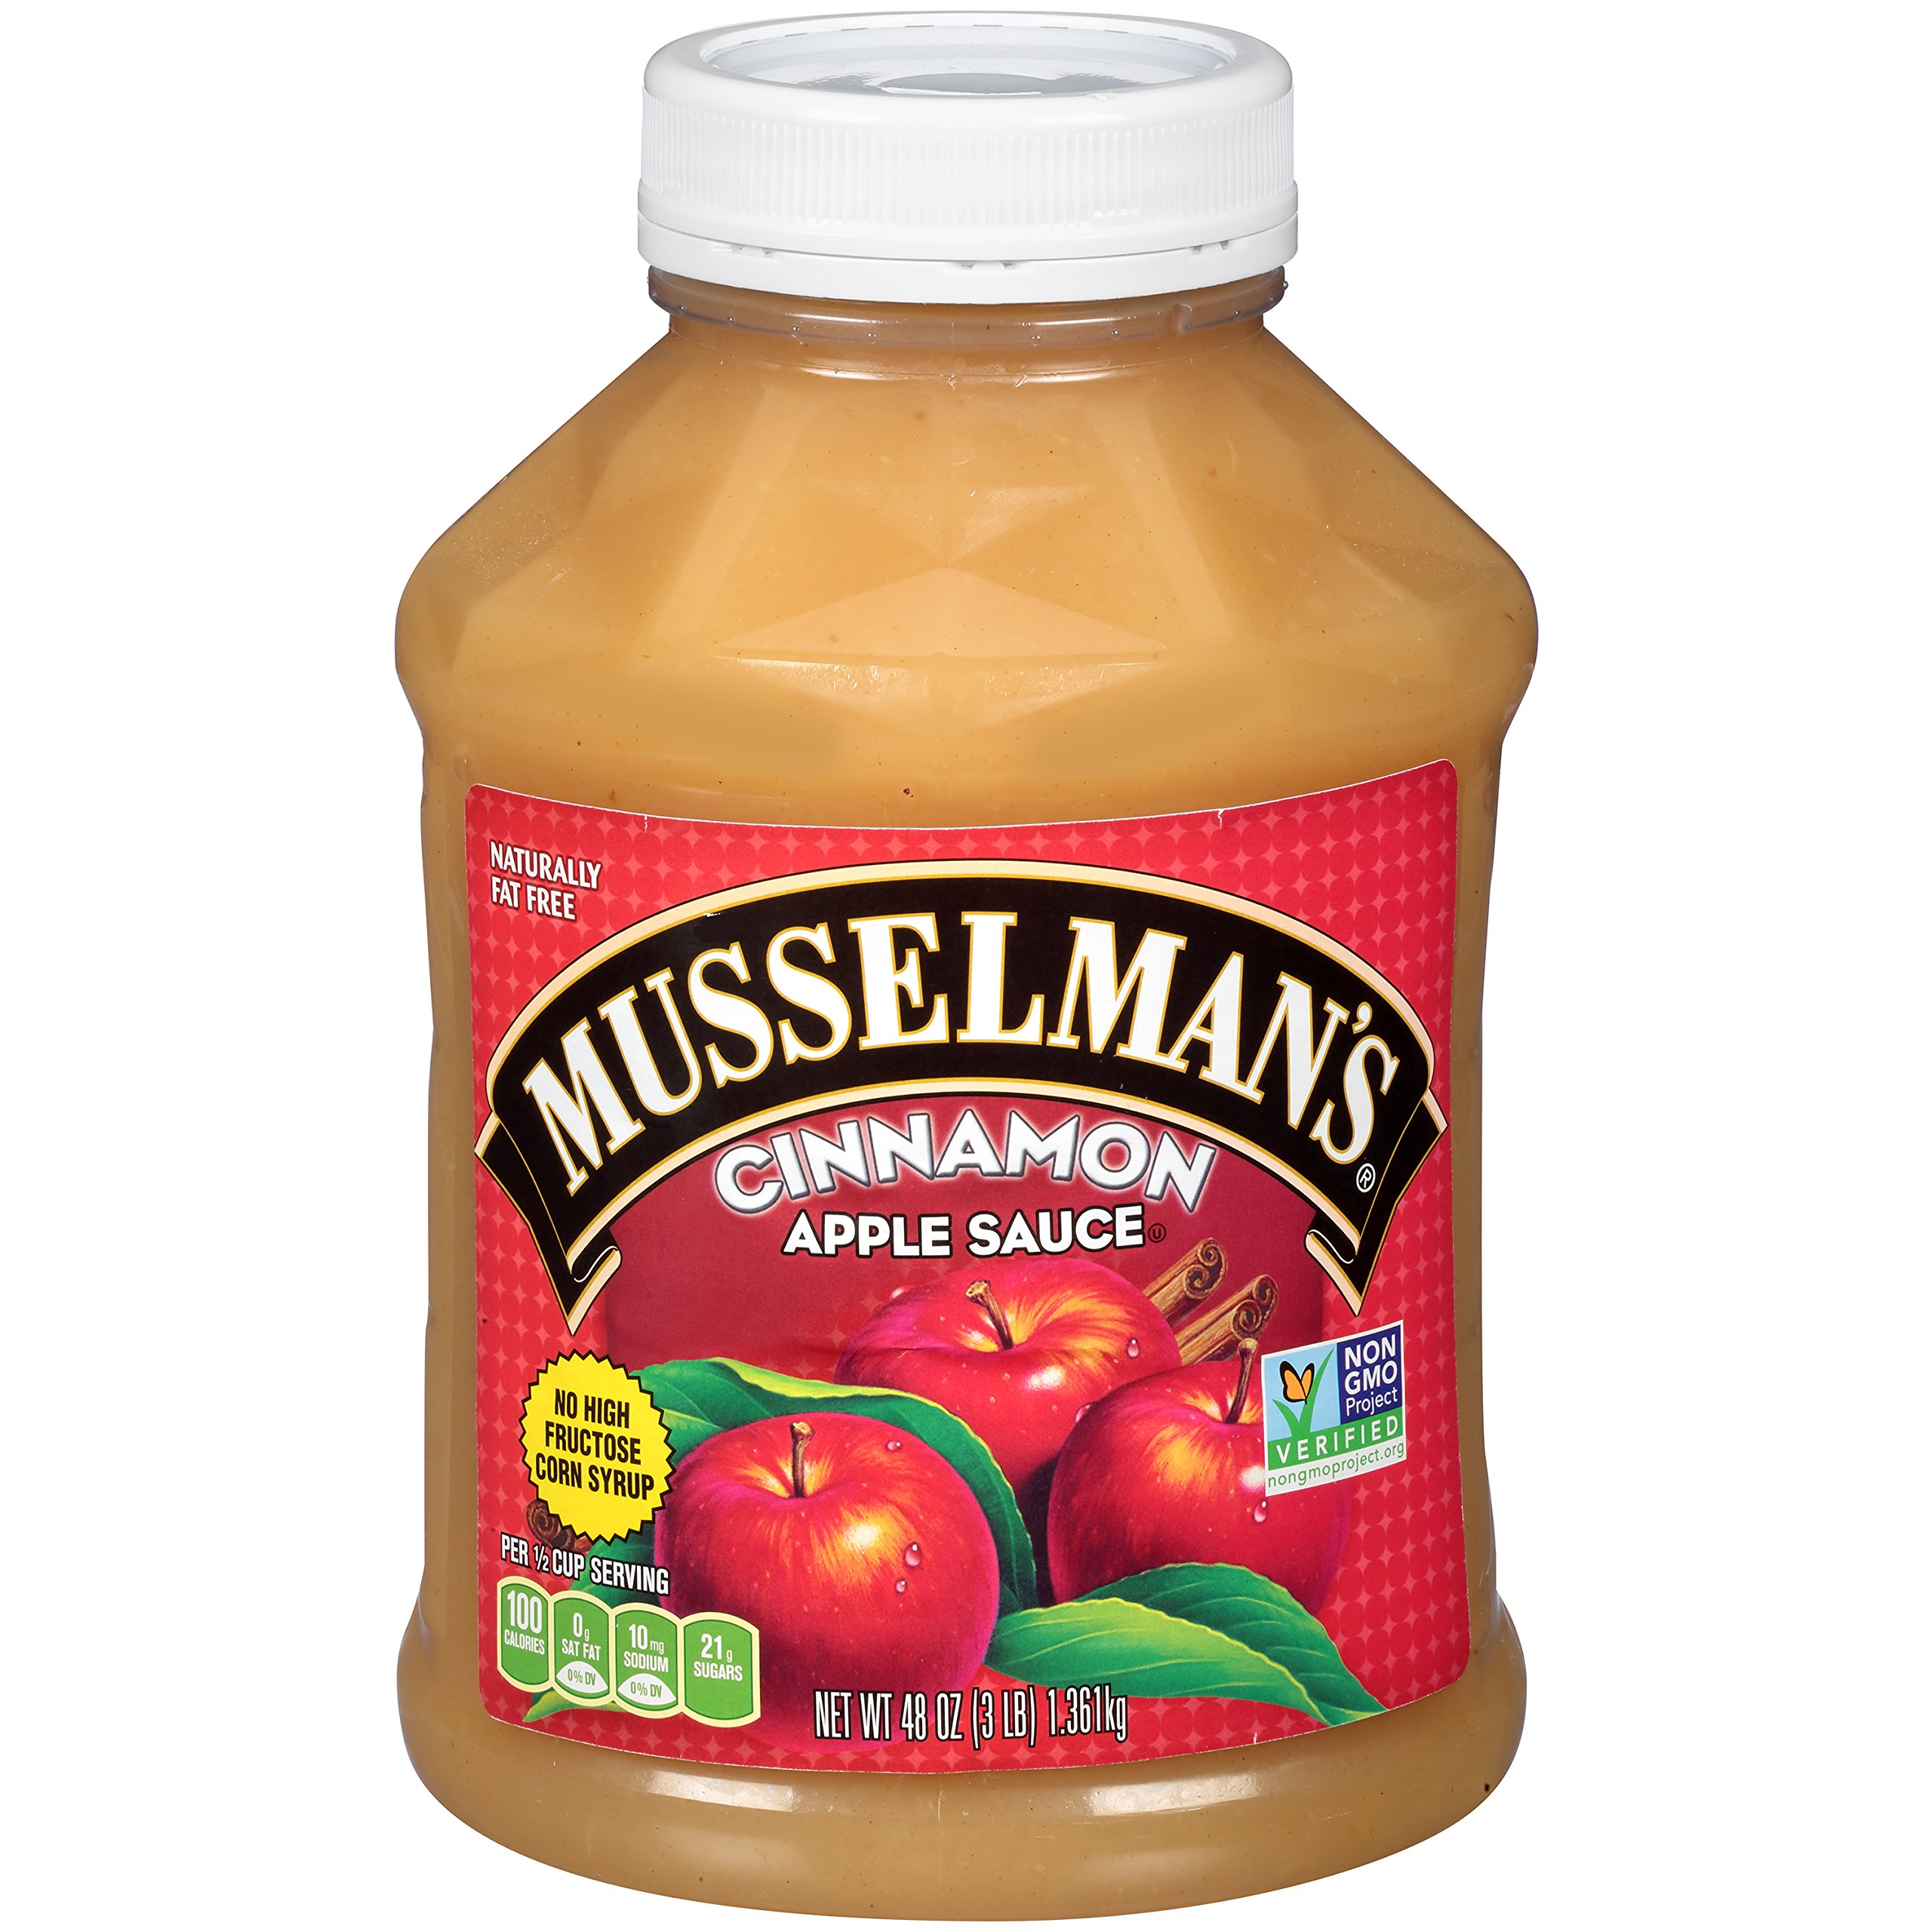 Musselman's Cinnamon Apple Sauce, 48 Ounce (Pack of 8)